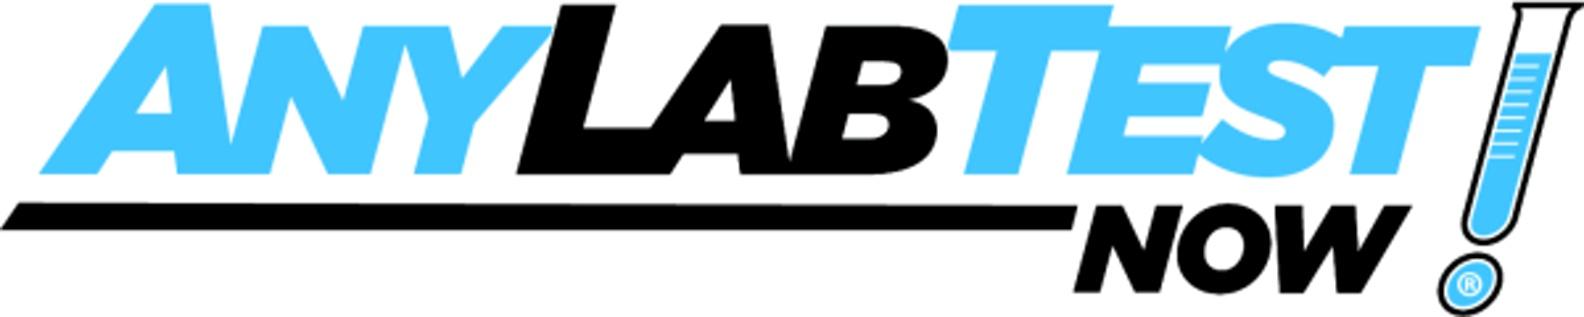 Any Lab Test Now - Longmont Logo